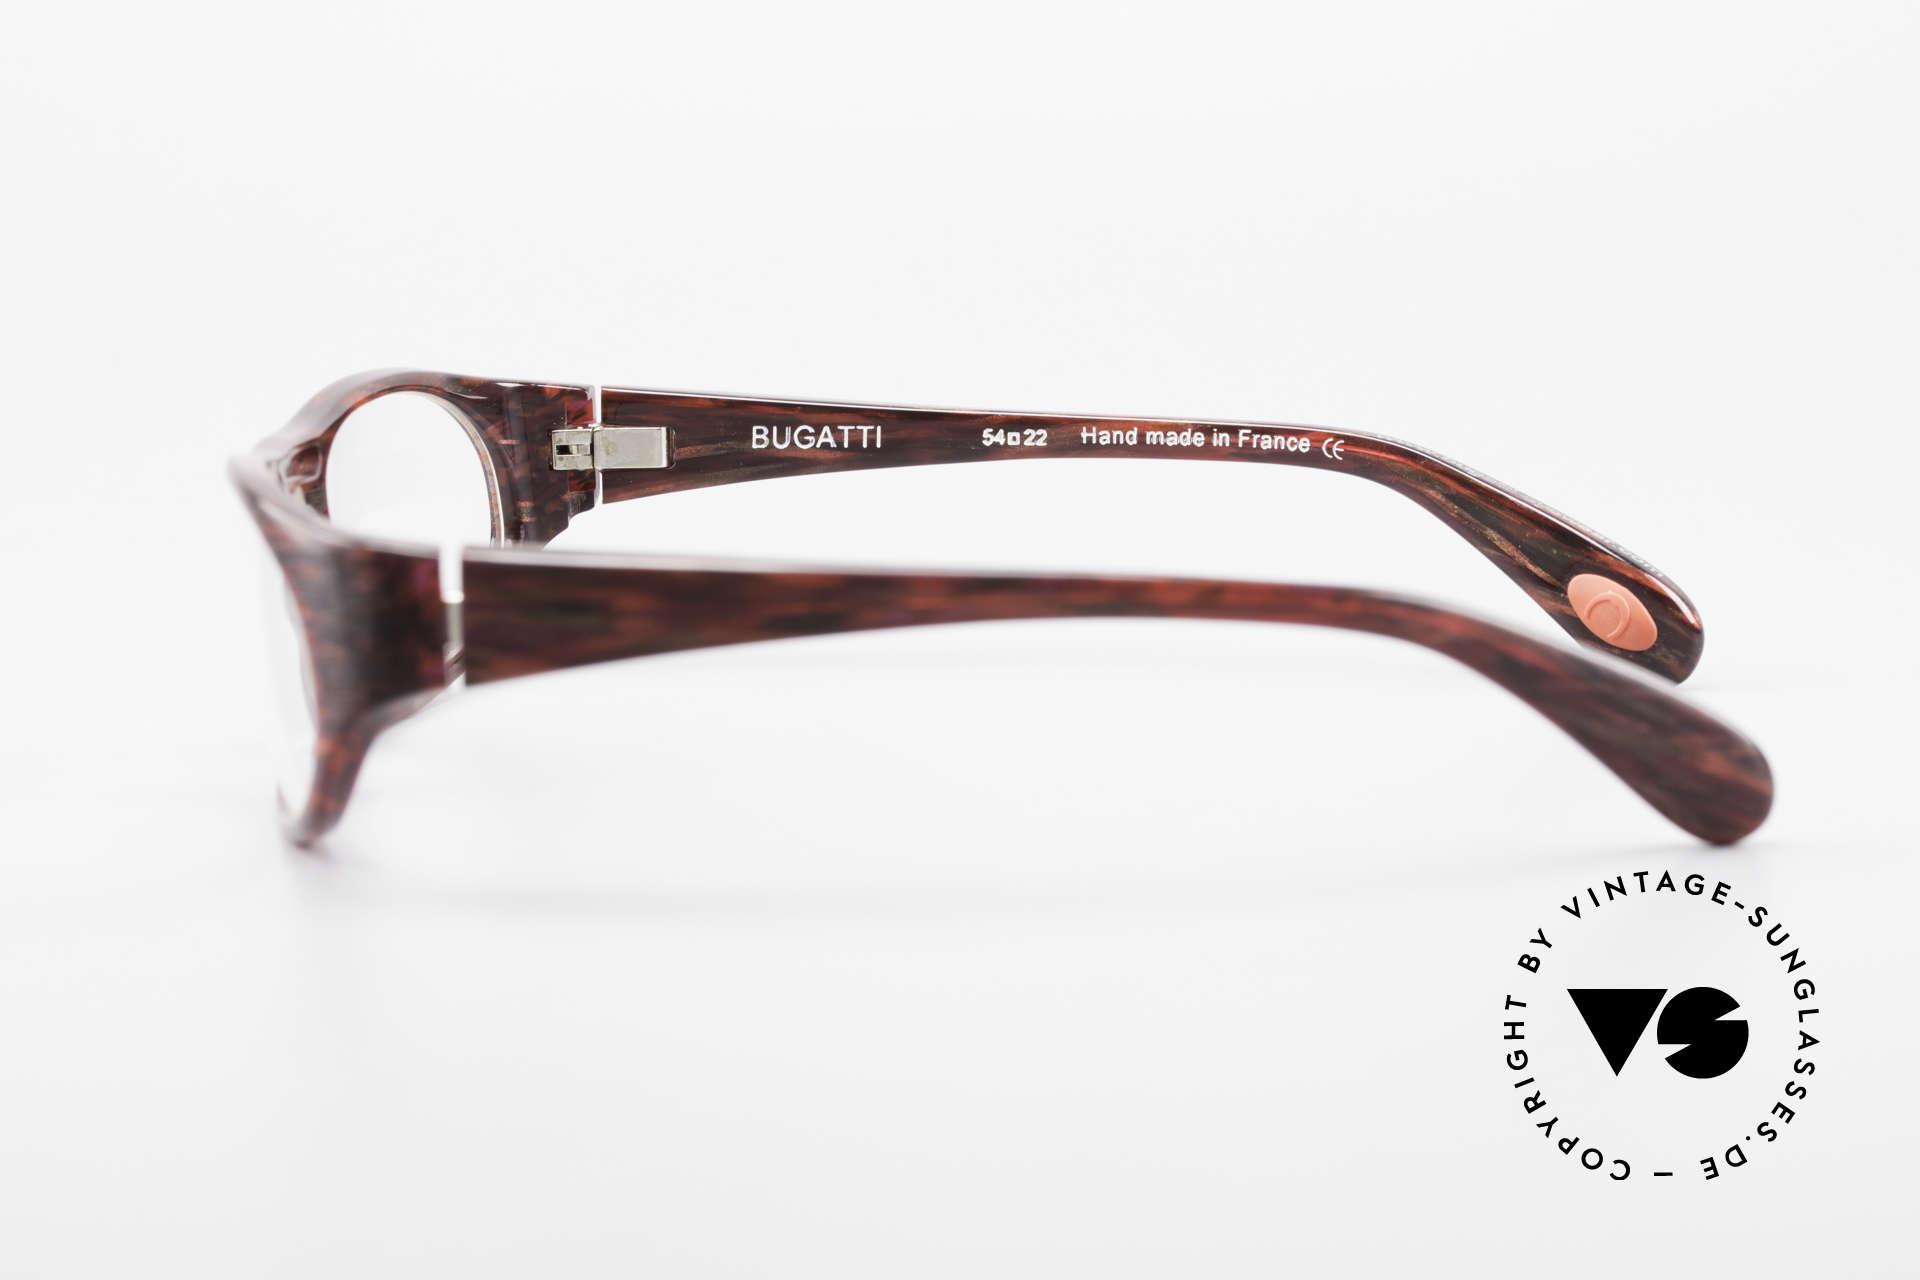 Bugatti 220 Rare Designer Luxury Glasses, Size: medium, Made for Men